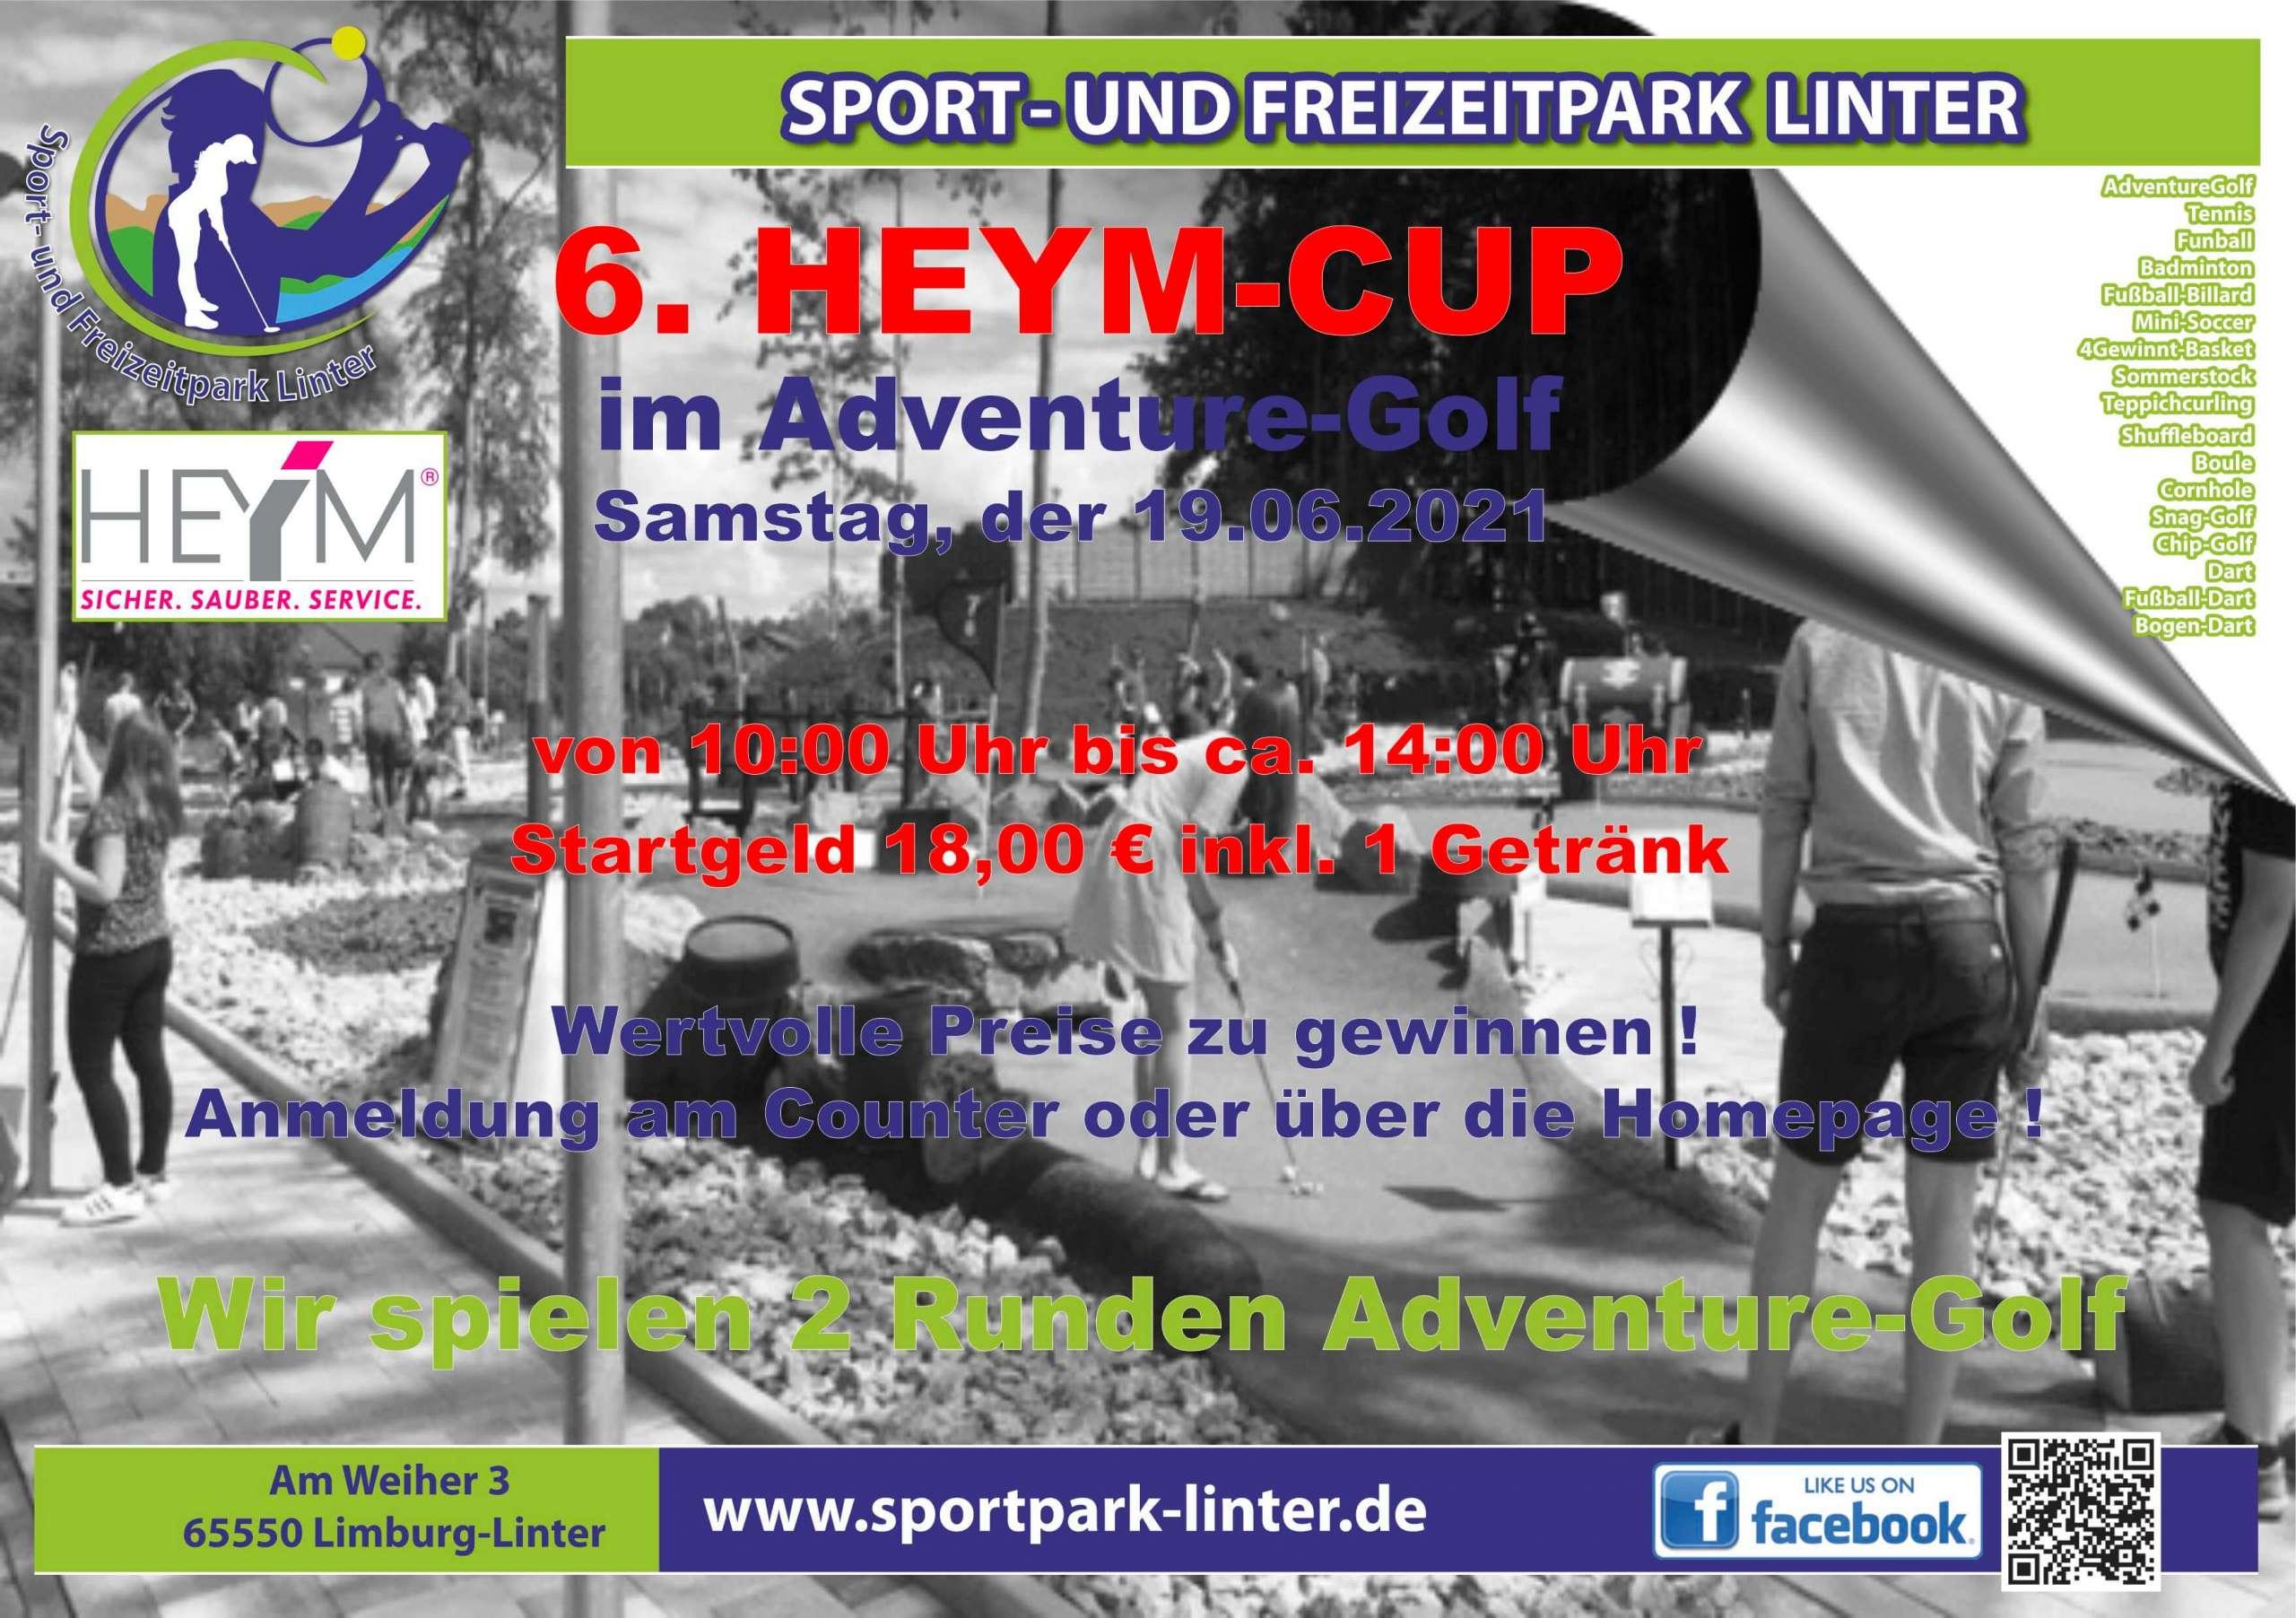 6. HEYM-CUP 2021